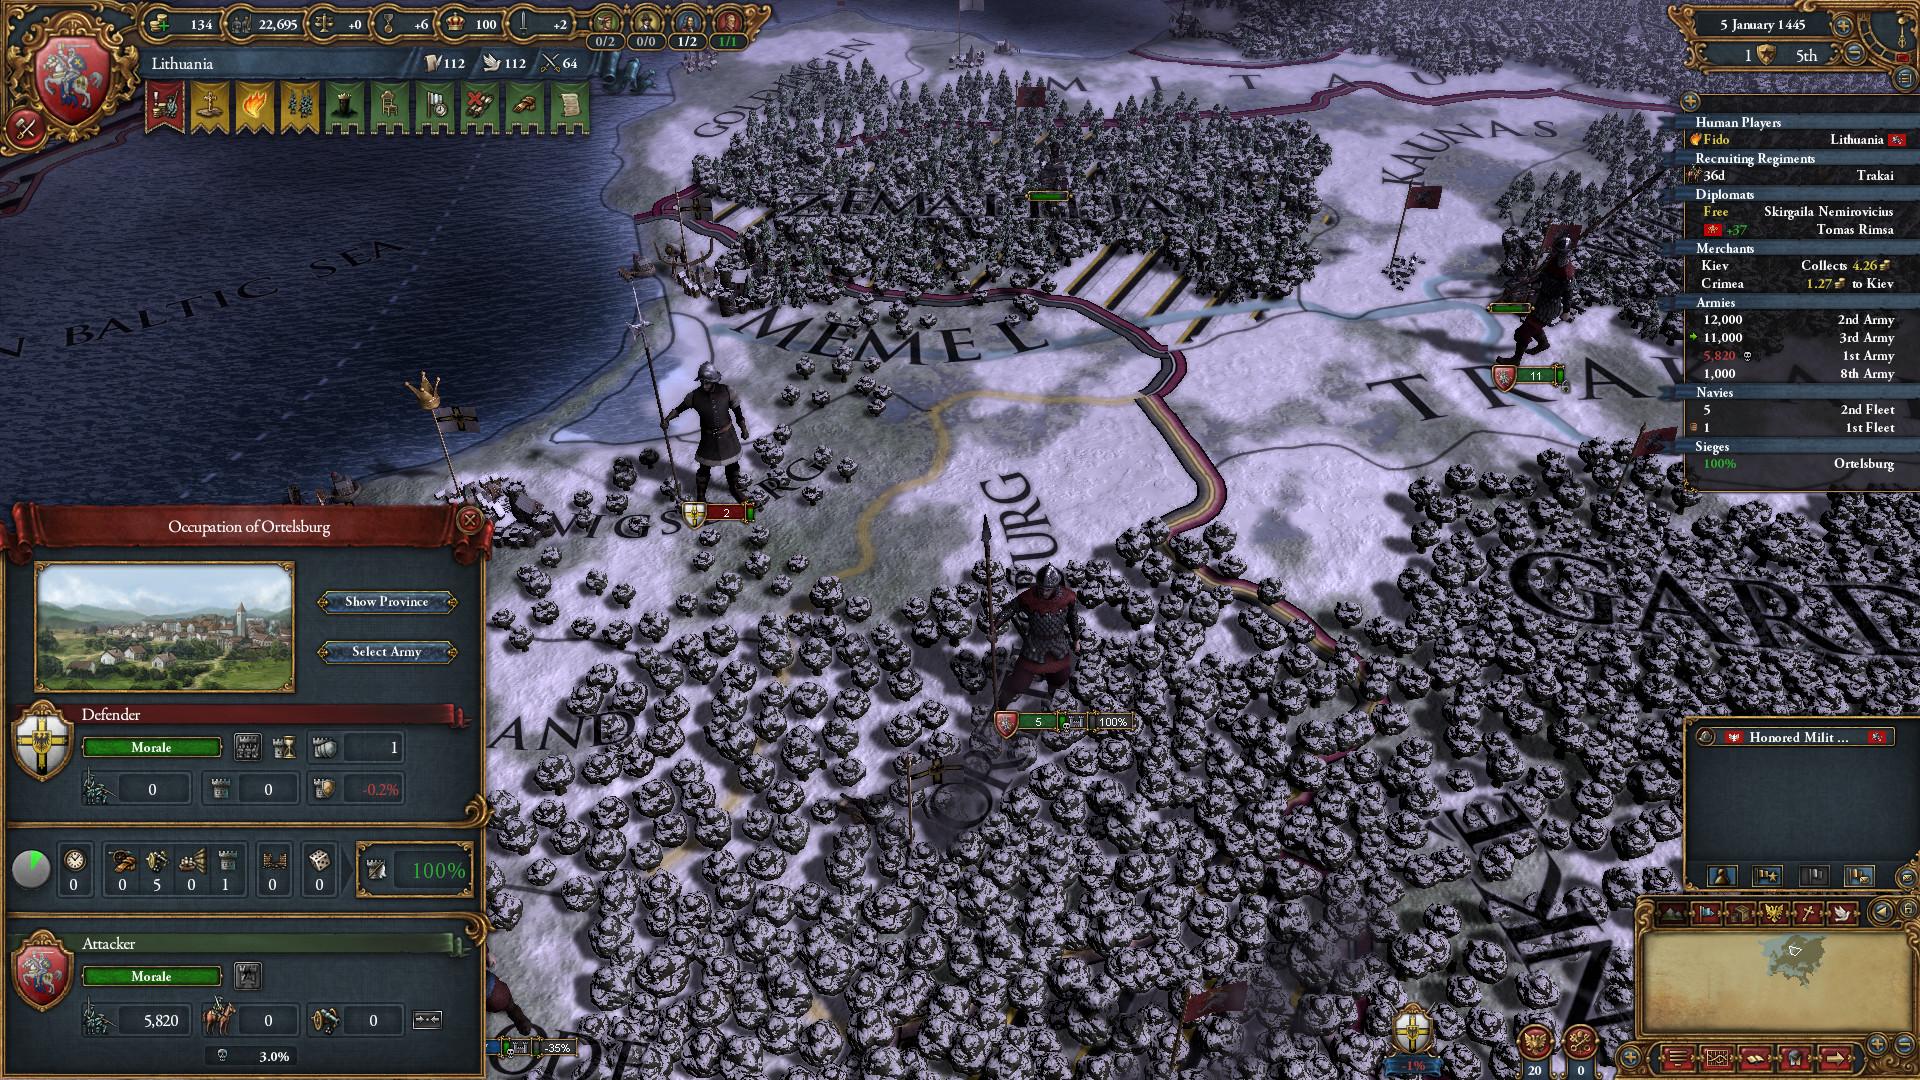 europa-universalis-iv-pc-screenshot-3